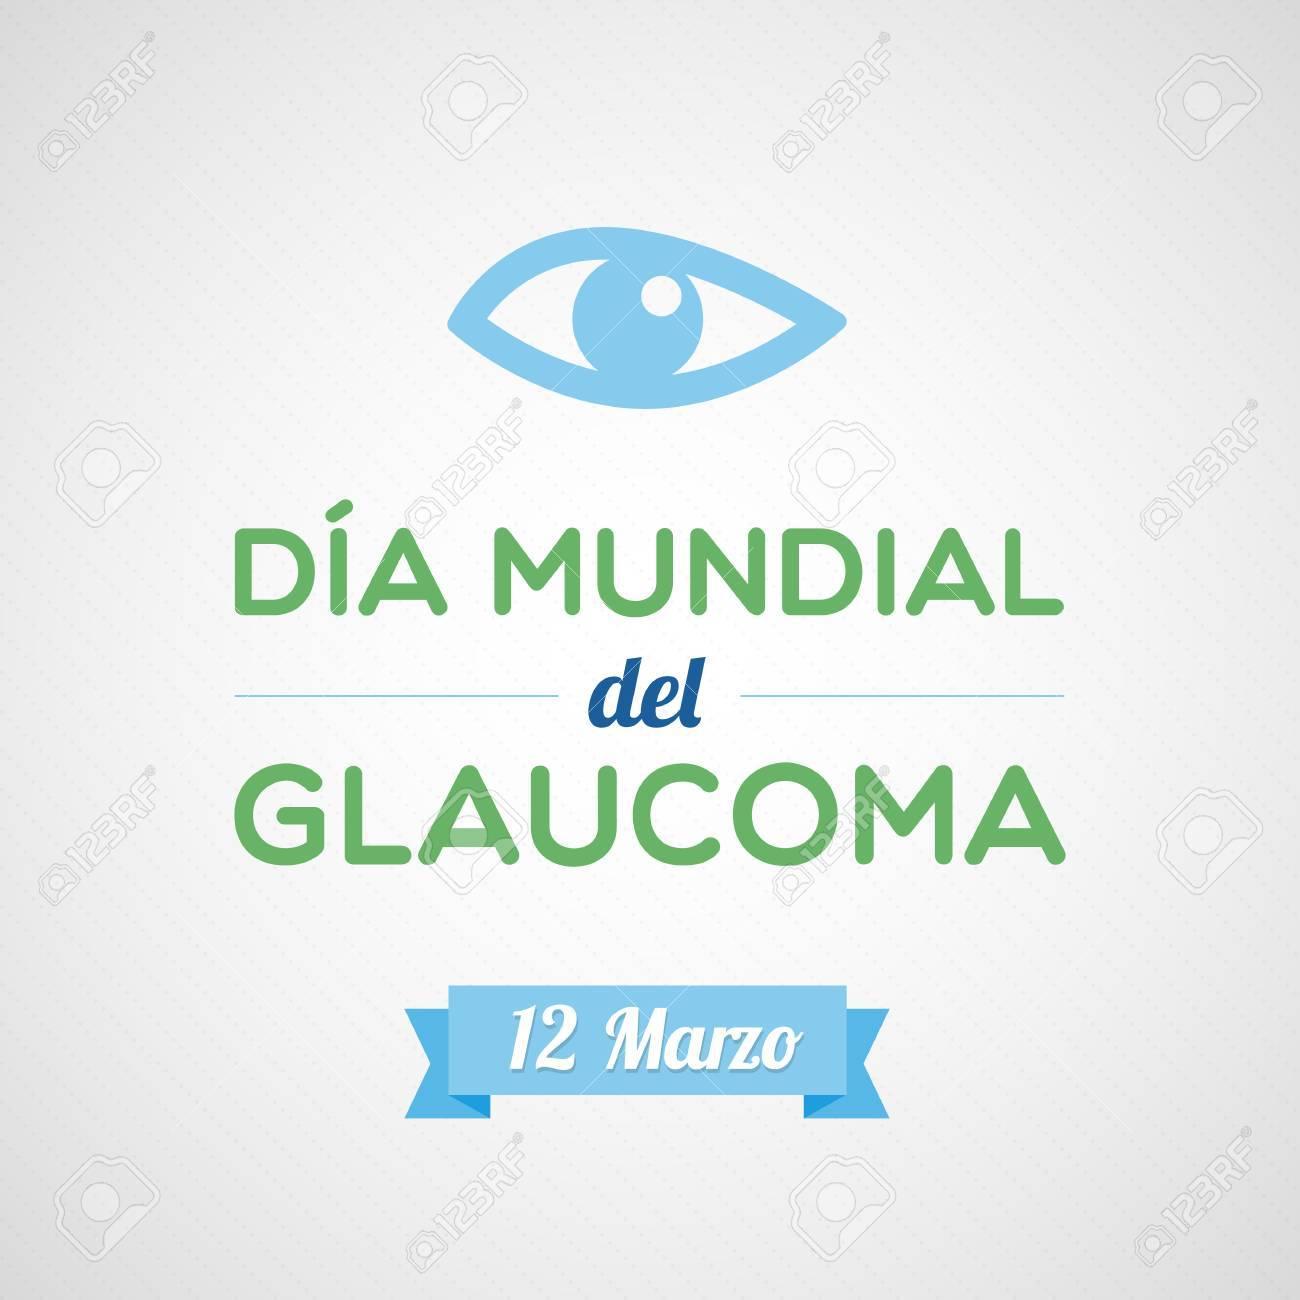 World Glaucoma Day in Spanish - 26543479